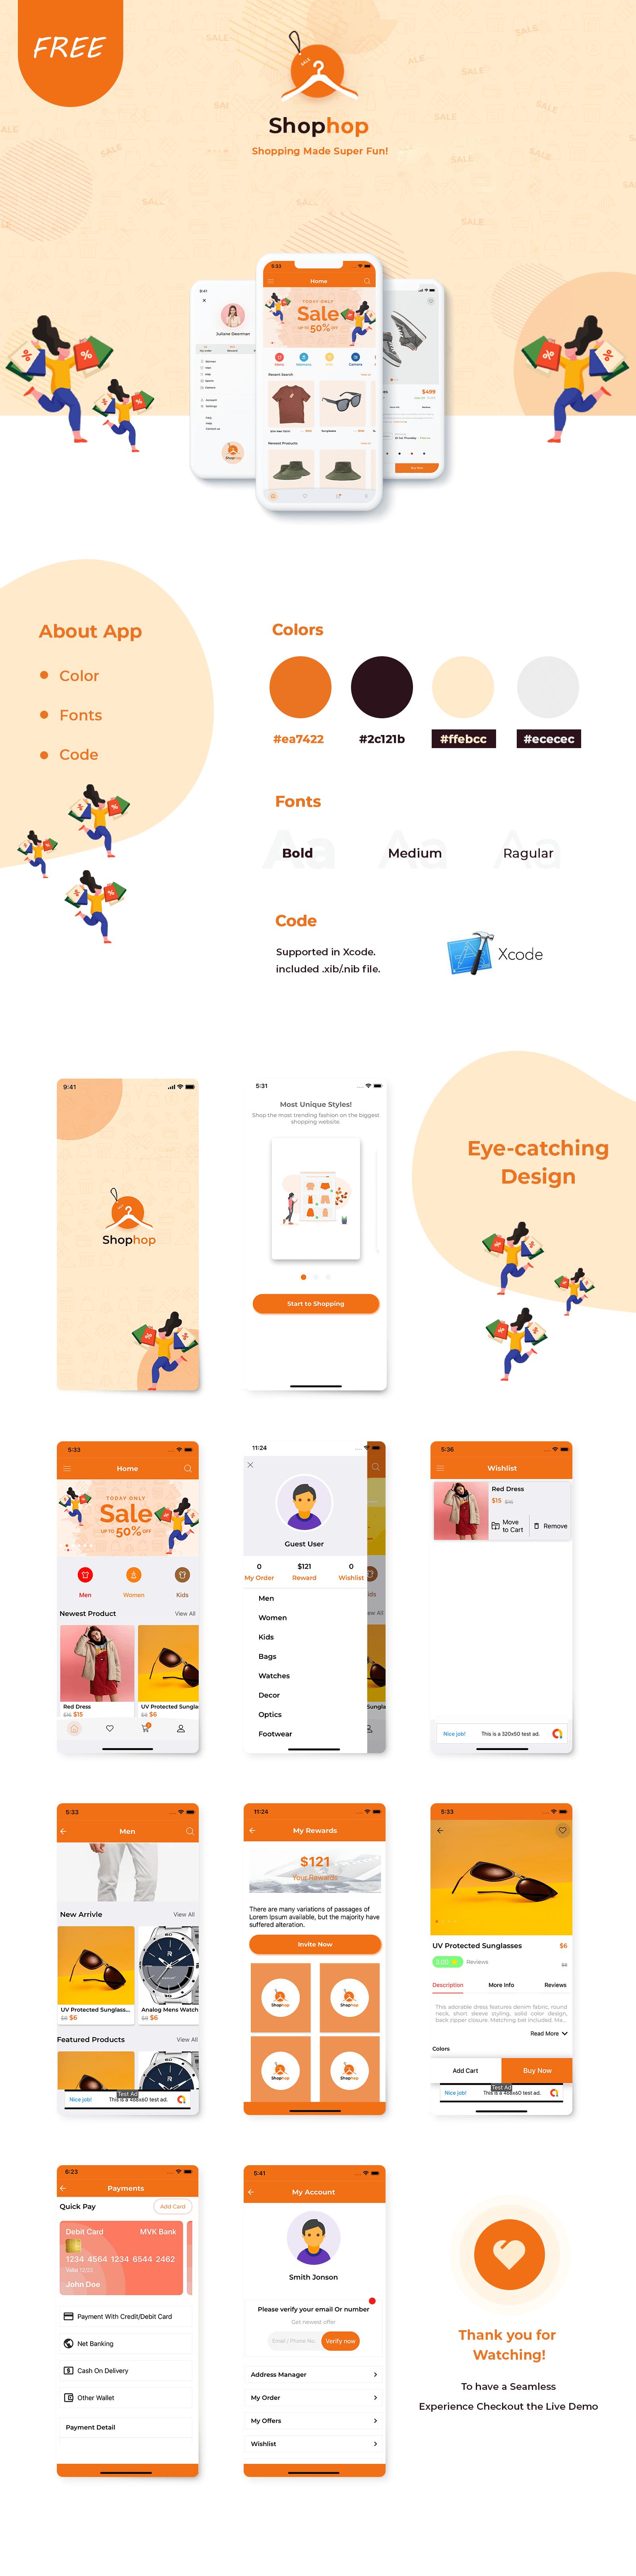 Free eCommerce App UI Templates Kotlin   Shophop Android UI   Iqonic Design free ecommerce app ui templates kotlin Shophop Android UI shophop min